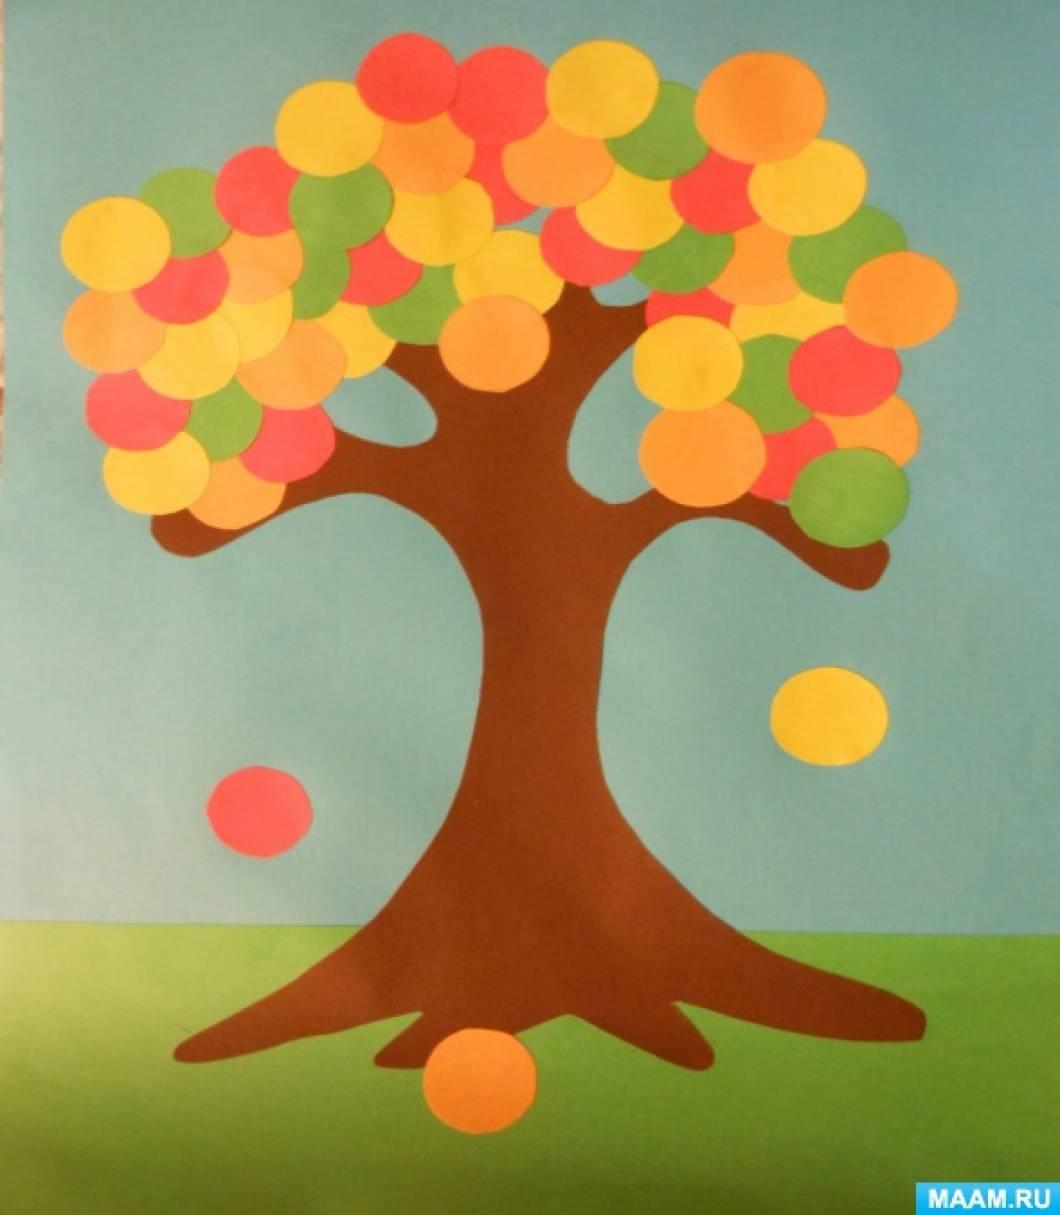 Мастер-класс по изготовлению аппликации «Яркие краски осени»